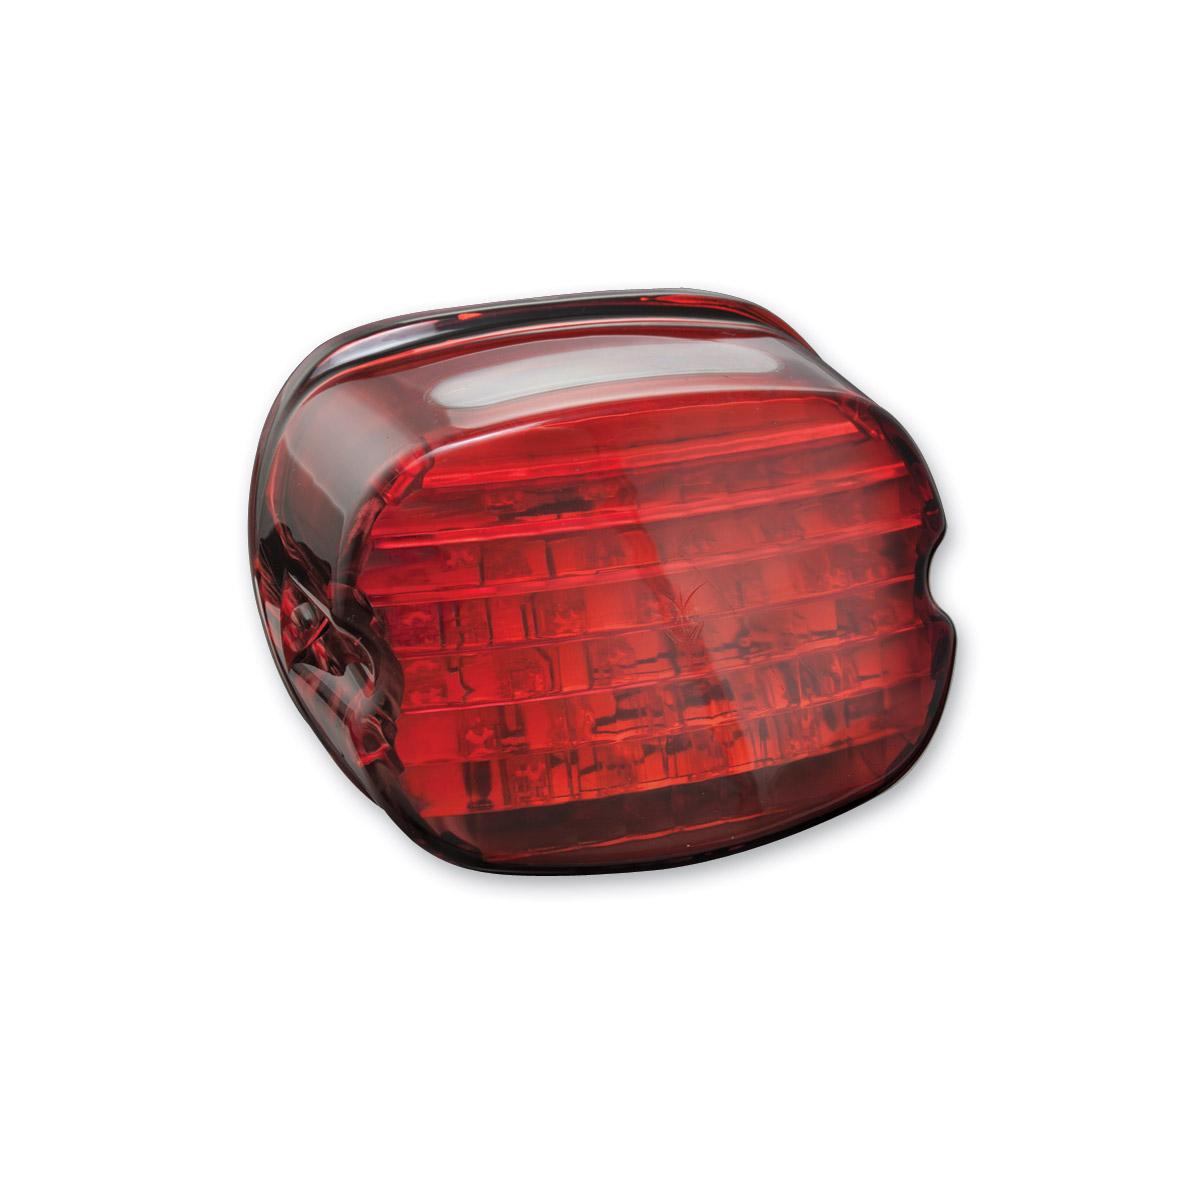 Kuryakyn Low Profile Red LED Taillight Conversion